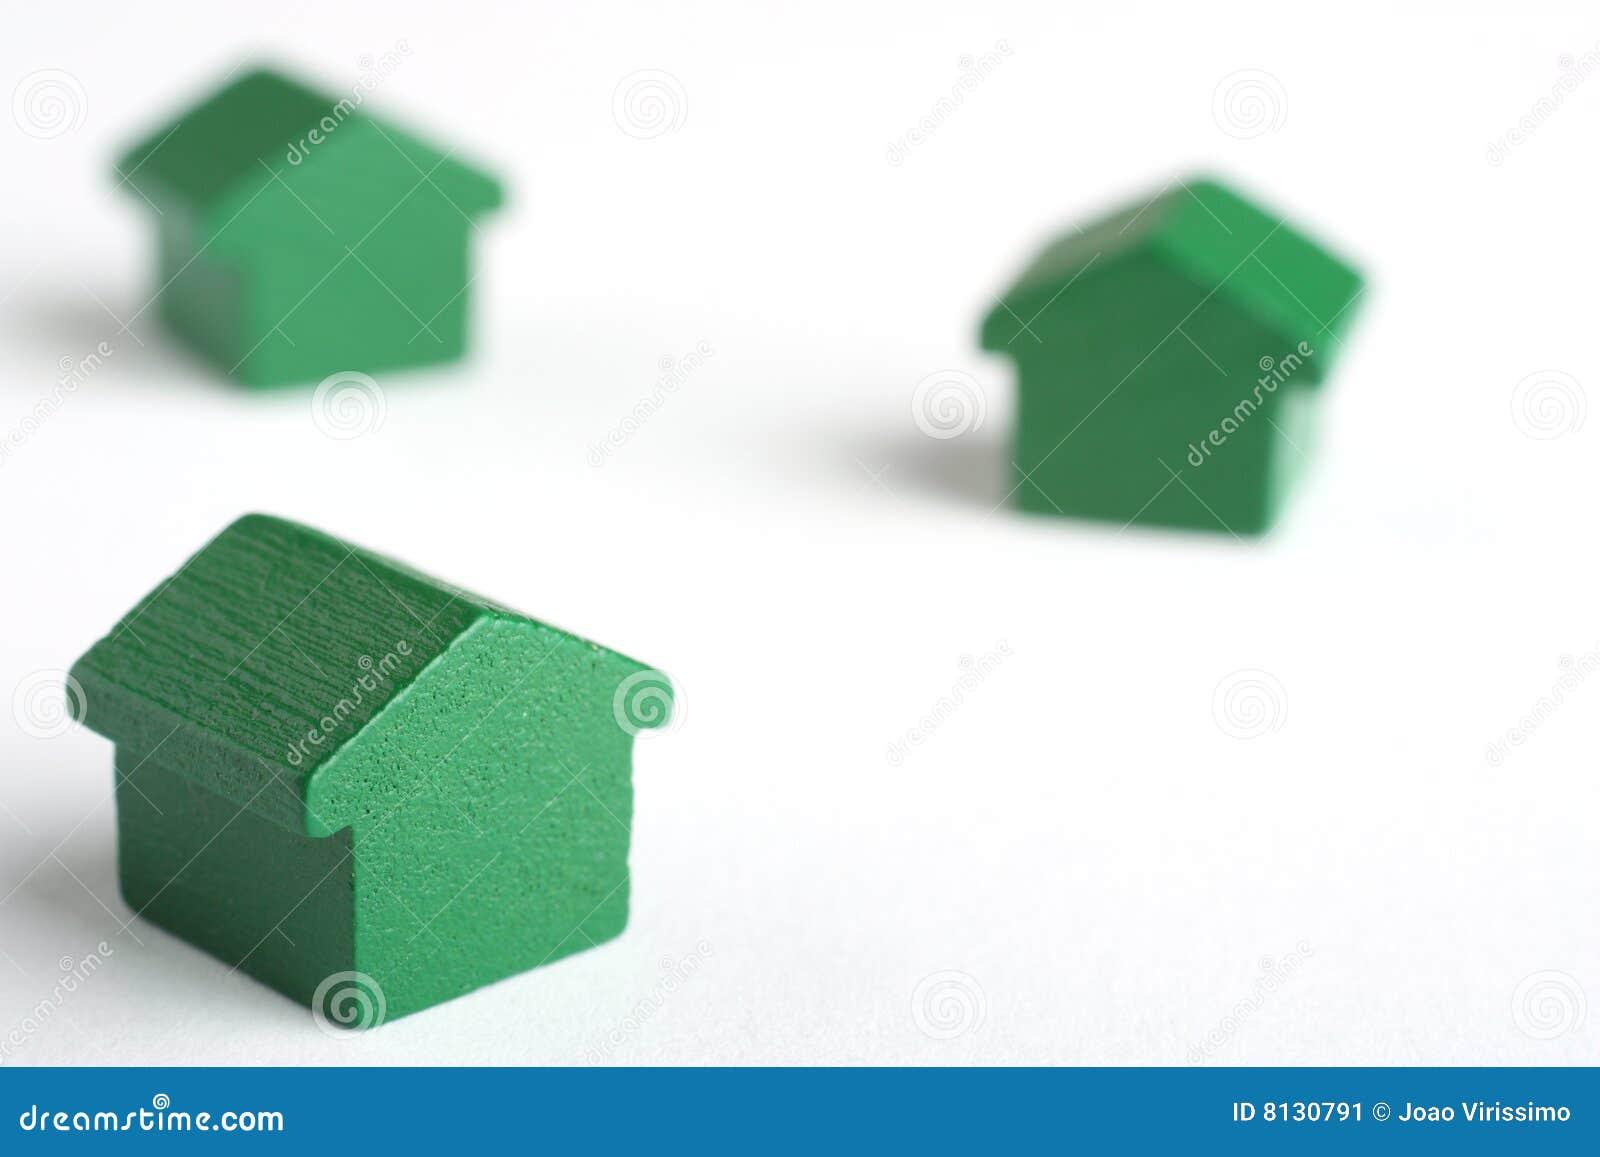 real estate concepts essay